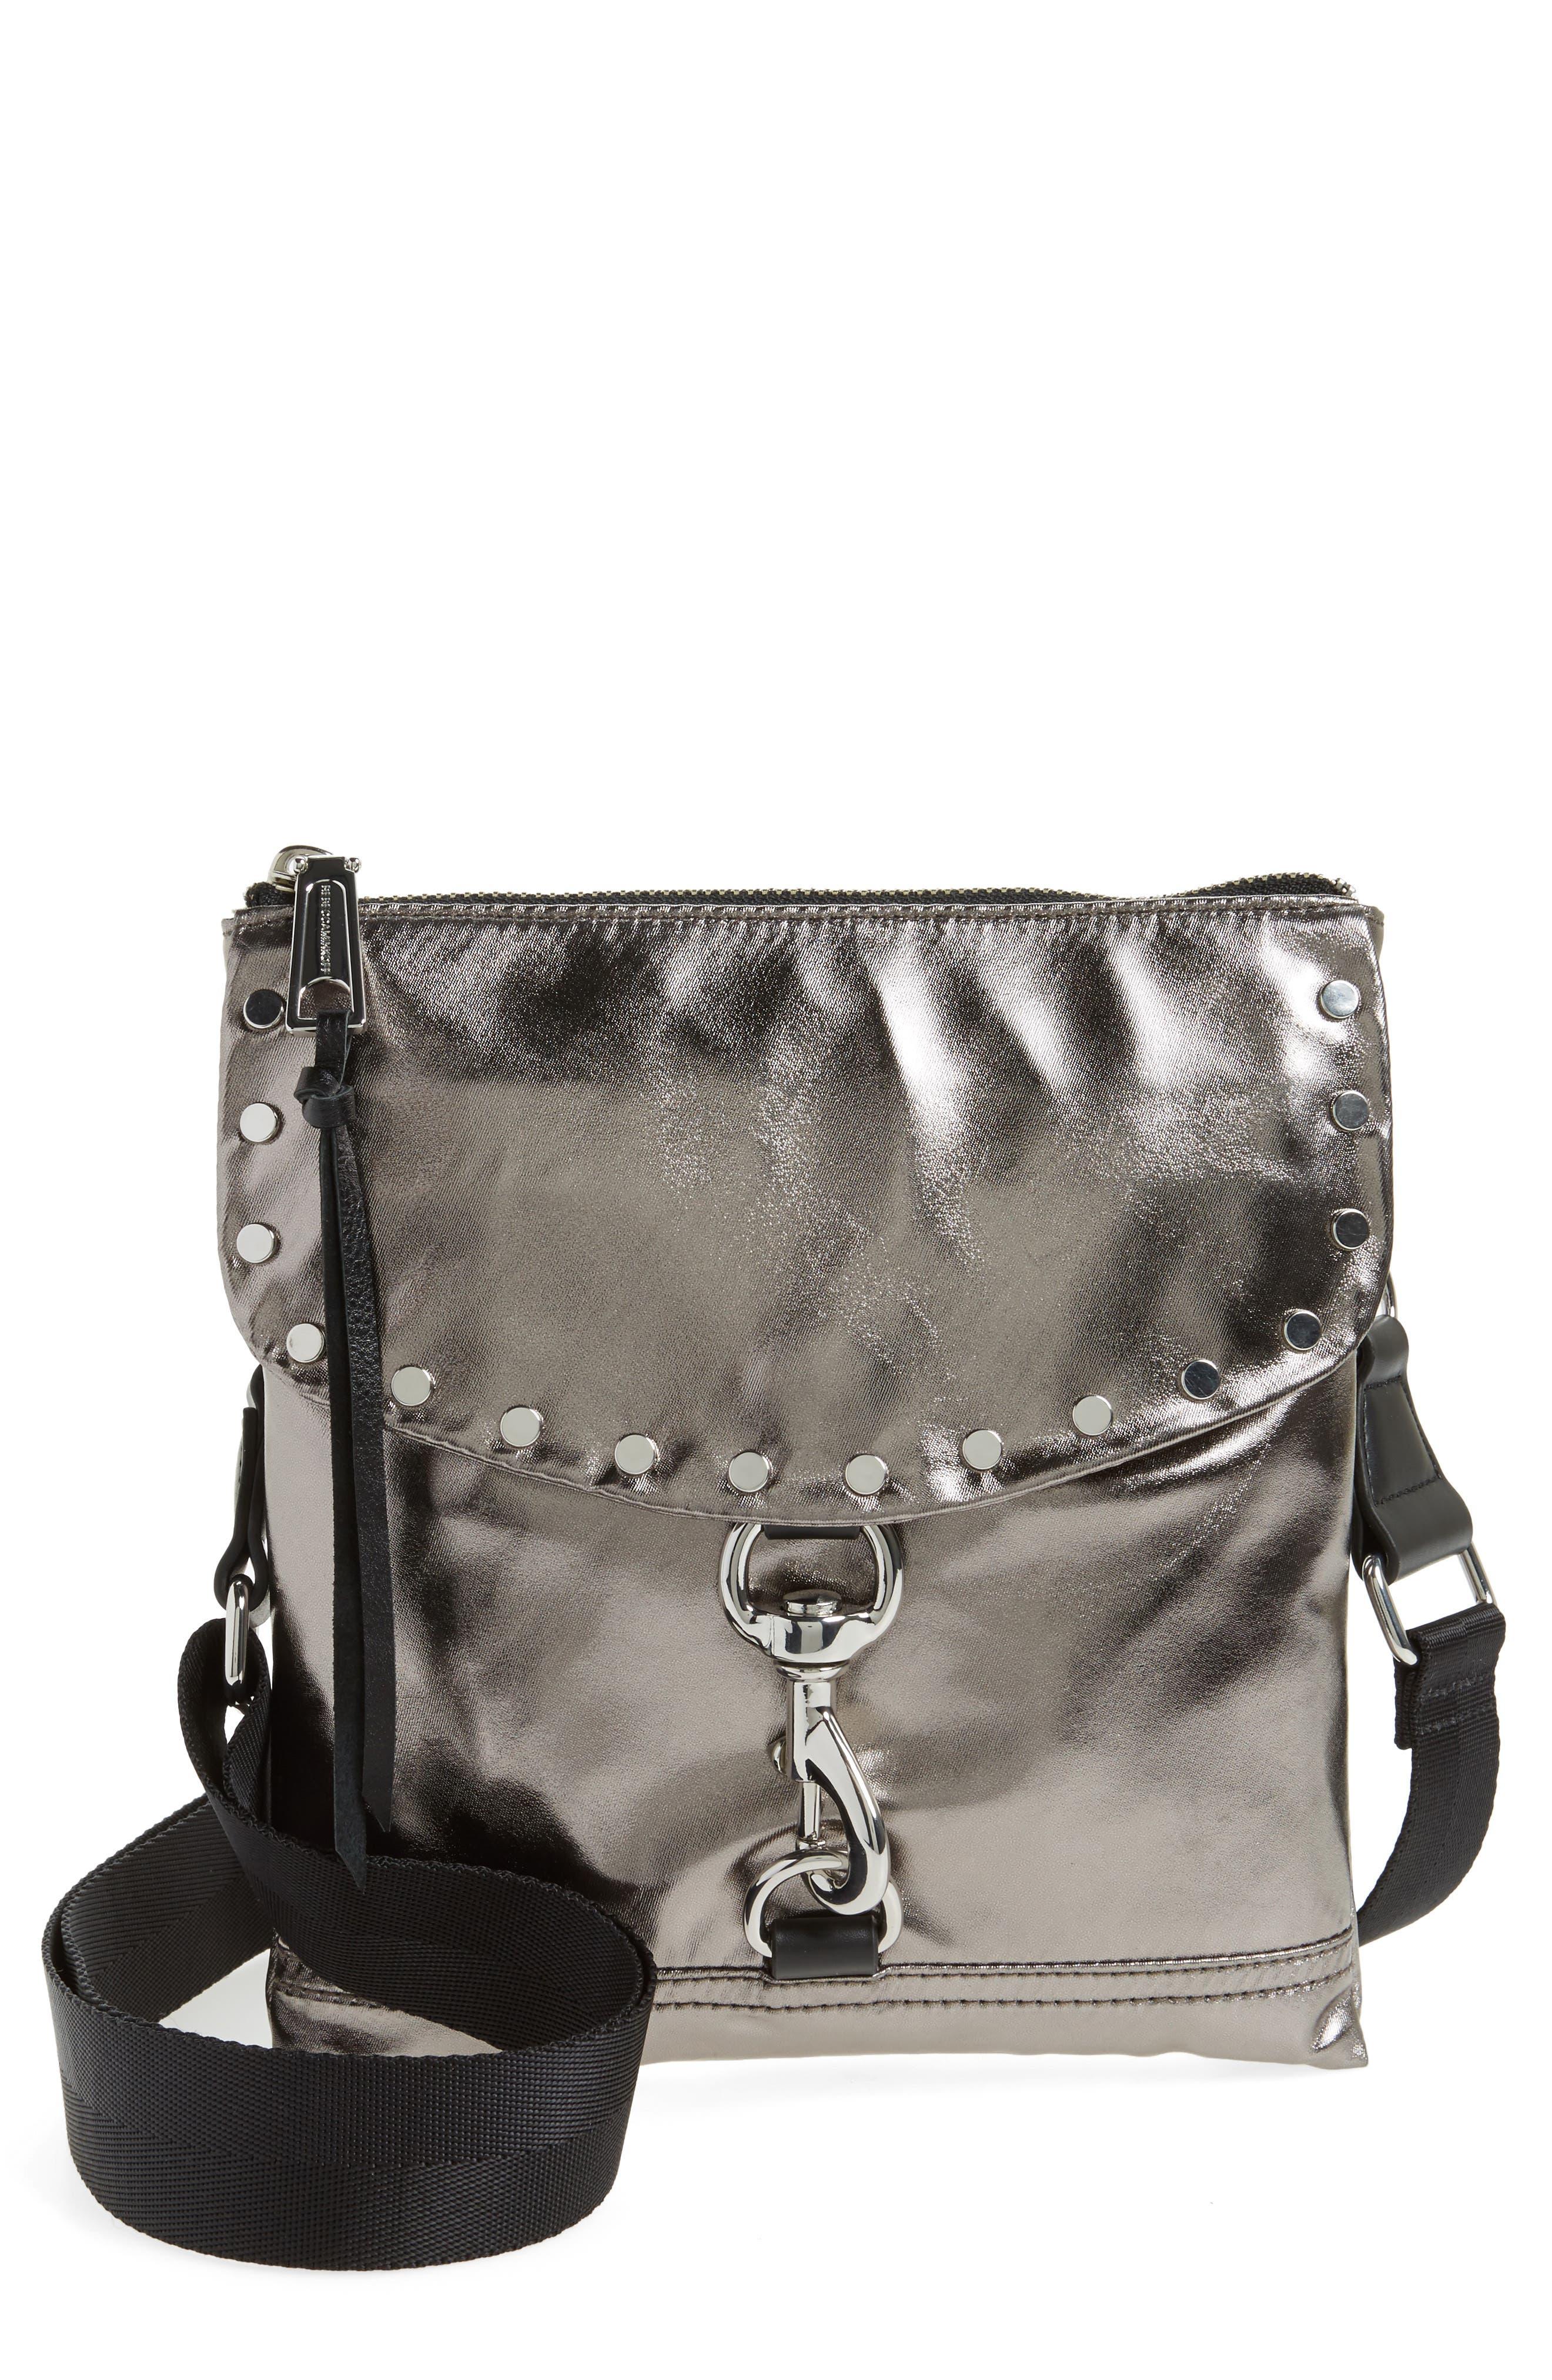 Main Image - Rebecca Minkoff Nylon Flap Crossbody Bag